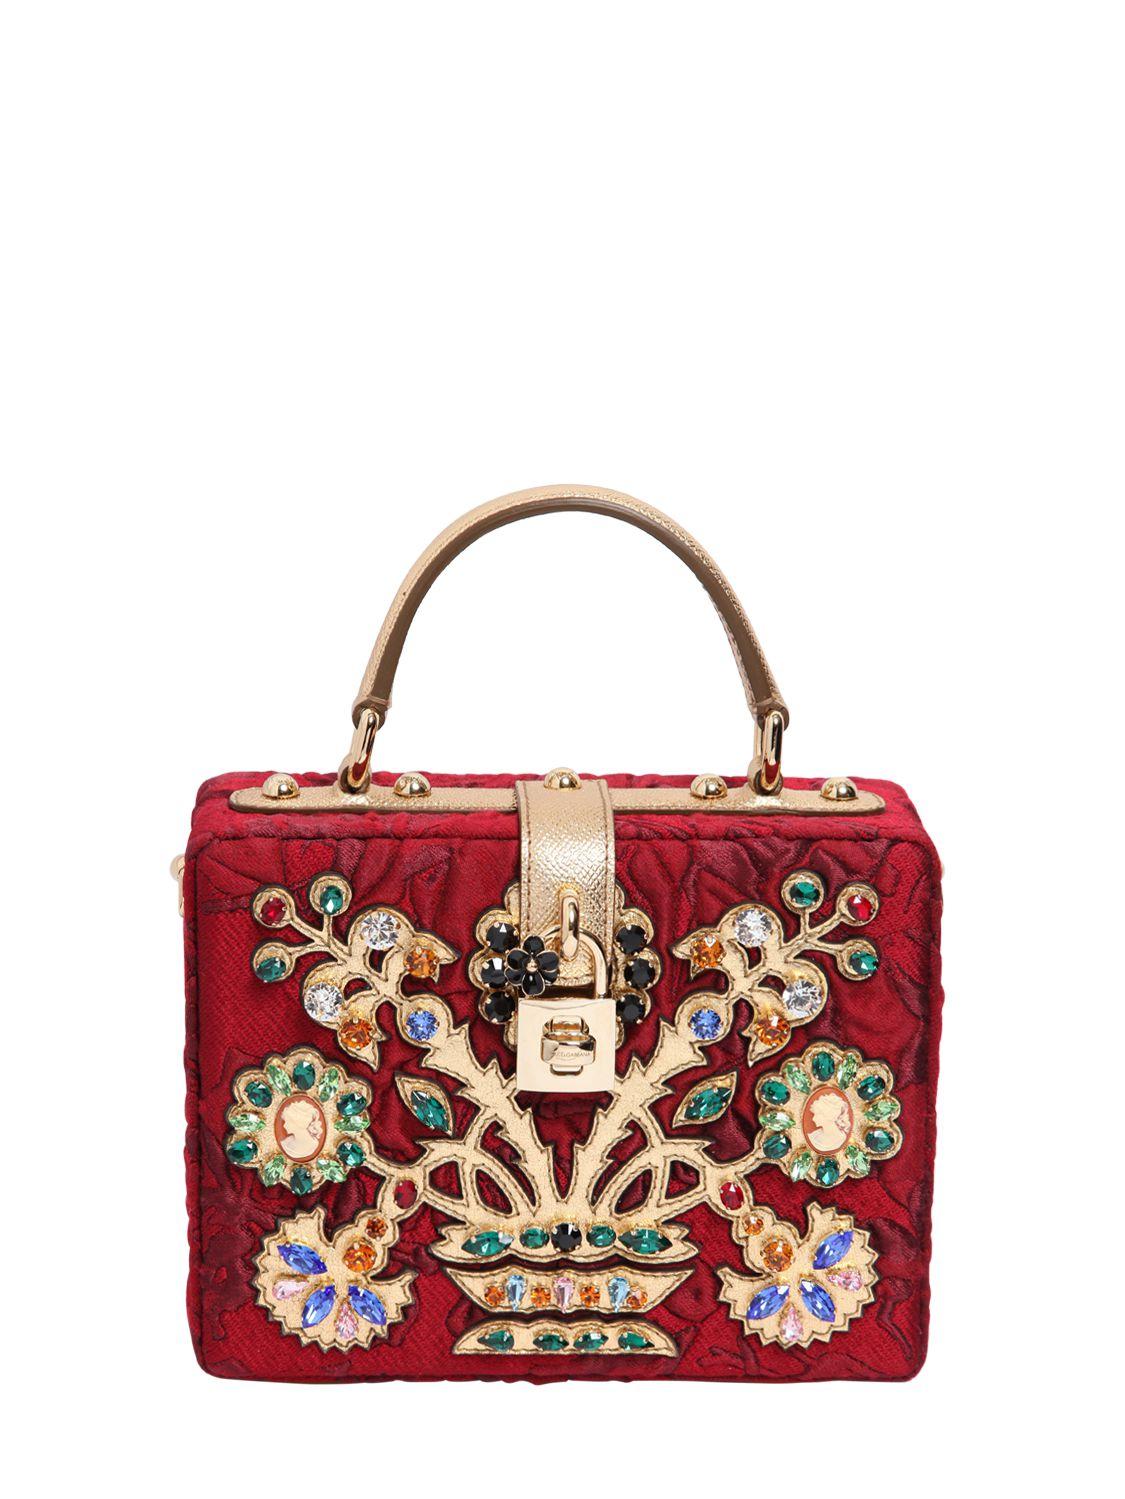 223433e1f7 Lyst - Dolce   Gabbana Embellished Brocade Dolce Bag in Red